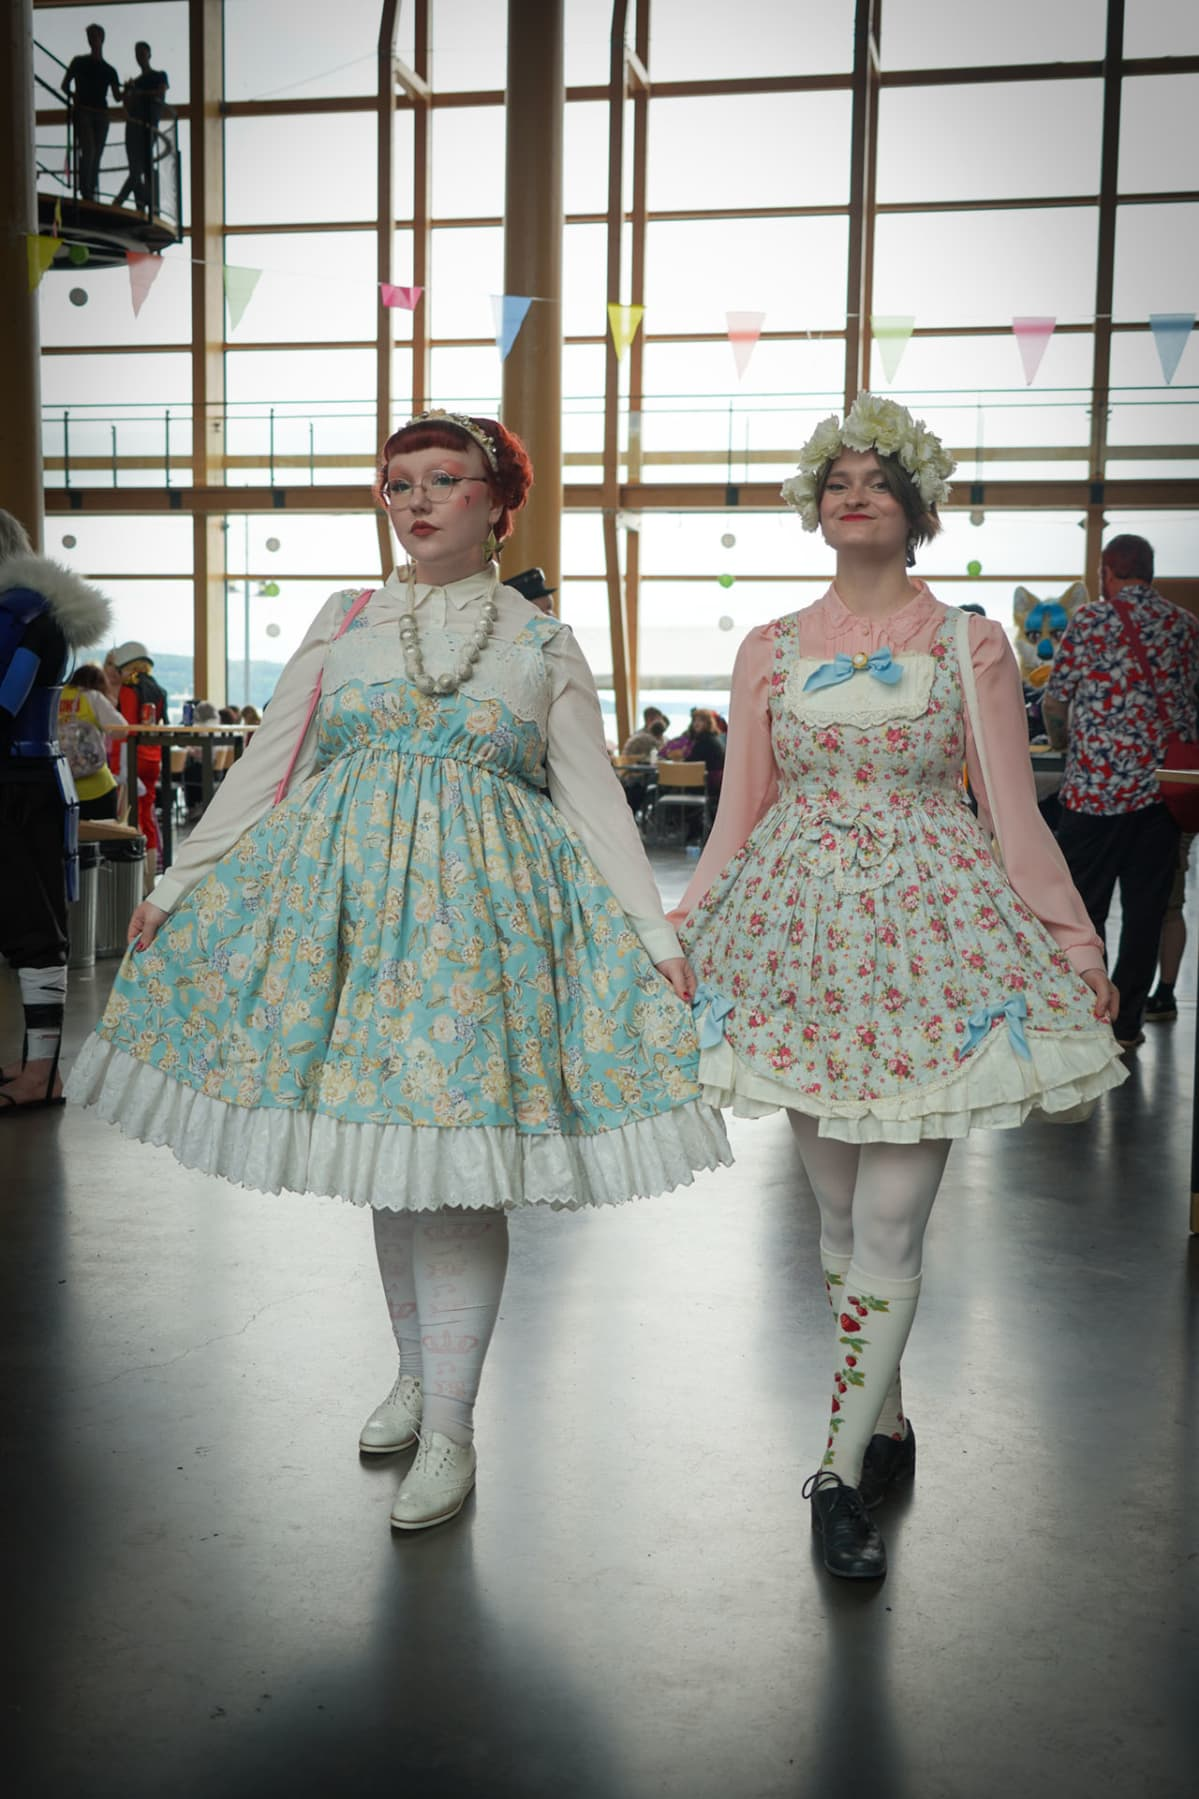 Emi Svinhufvud, Adeliina Paloniemi, sweet lolita, Desucon, cosplay